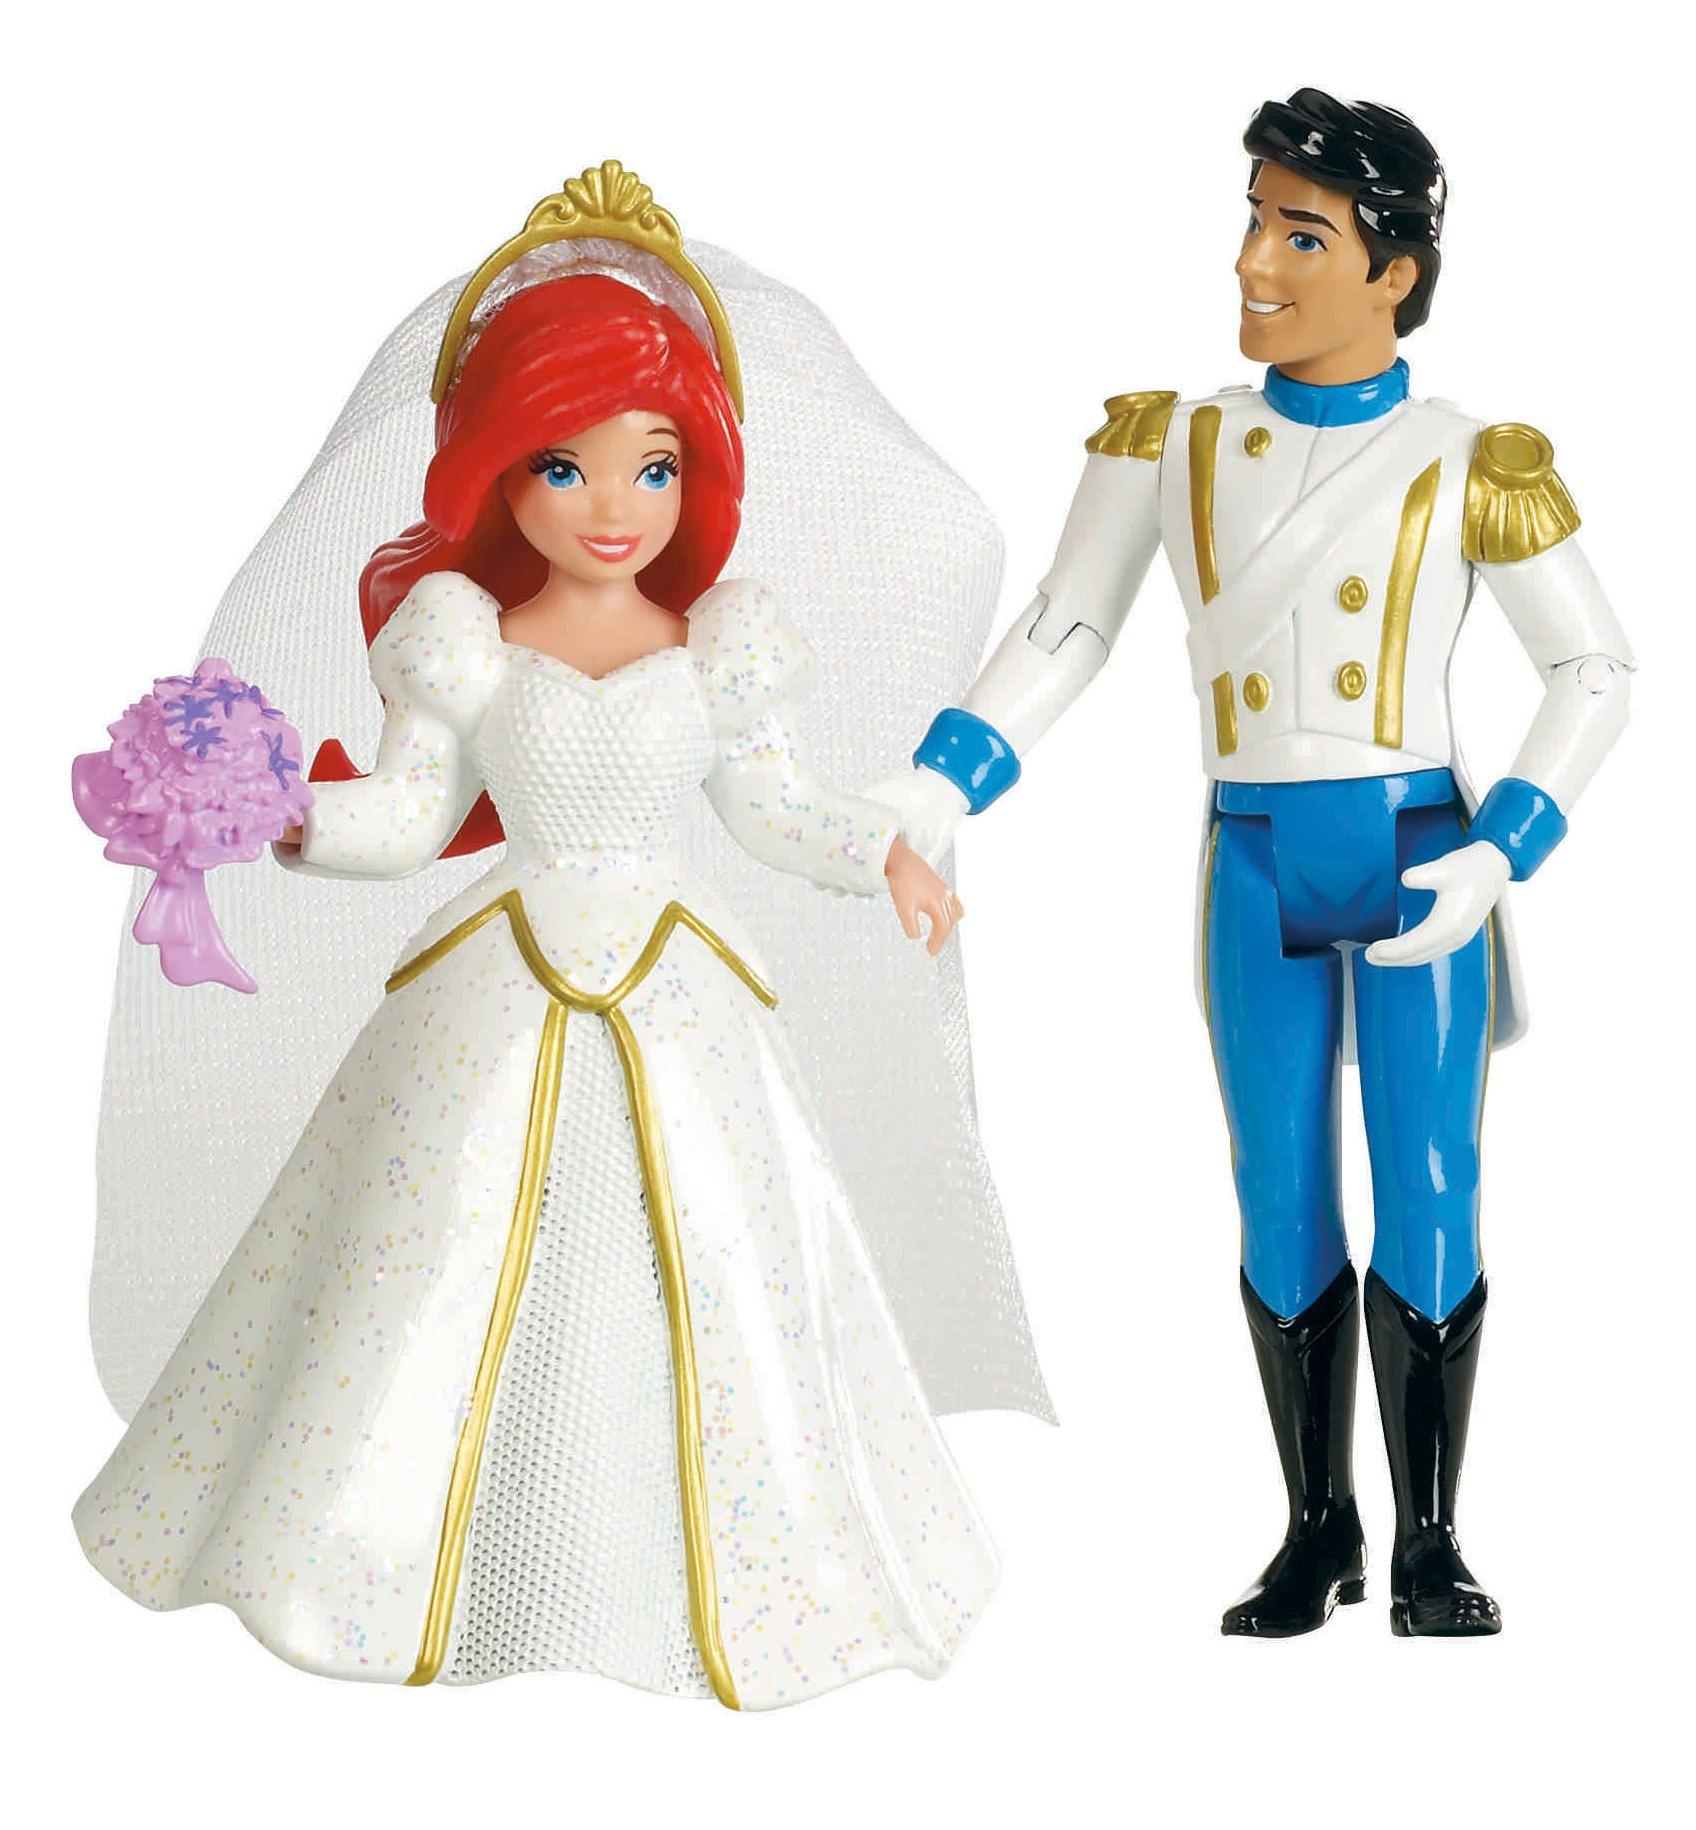 BARBIE DISNEY PRINCESS FAIRYTALE WEDDING GIFT SET BELLA ... |Disney Princess Wedding Set